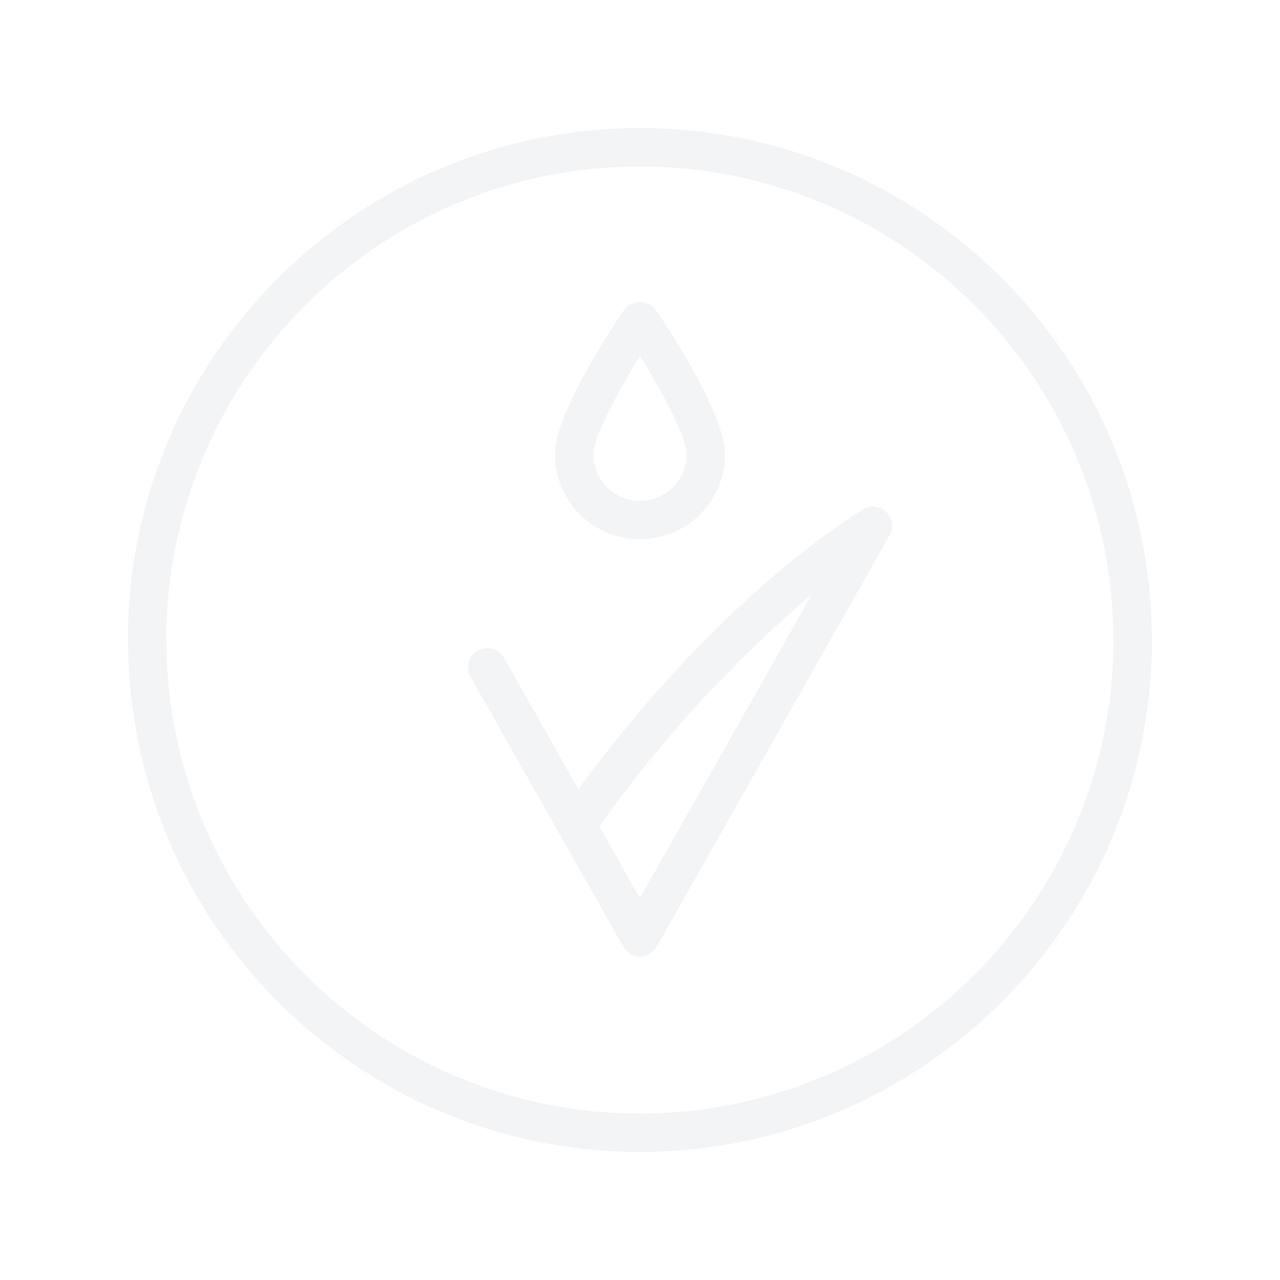 Elizabeth Arden 8 Hour Cream Lip Protectant 13ml